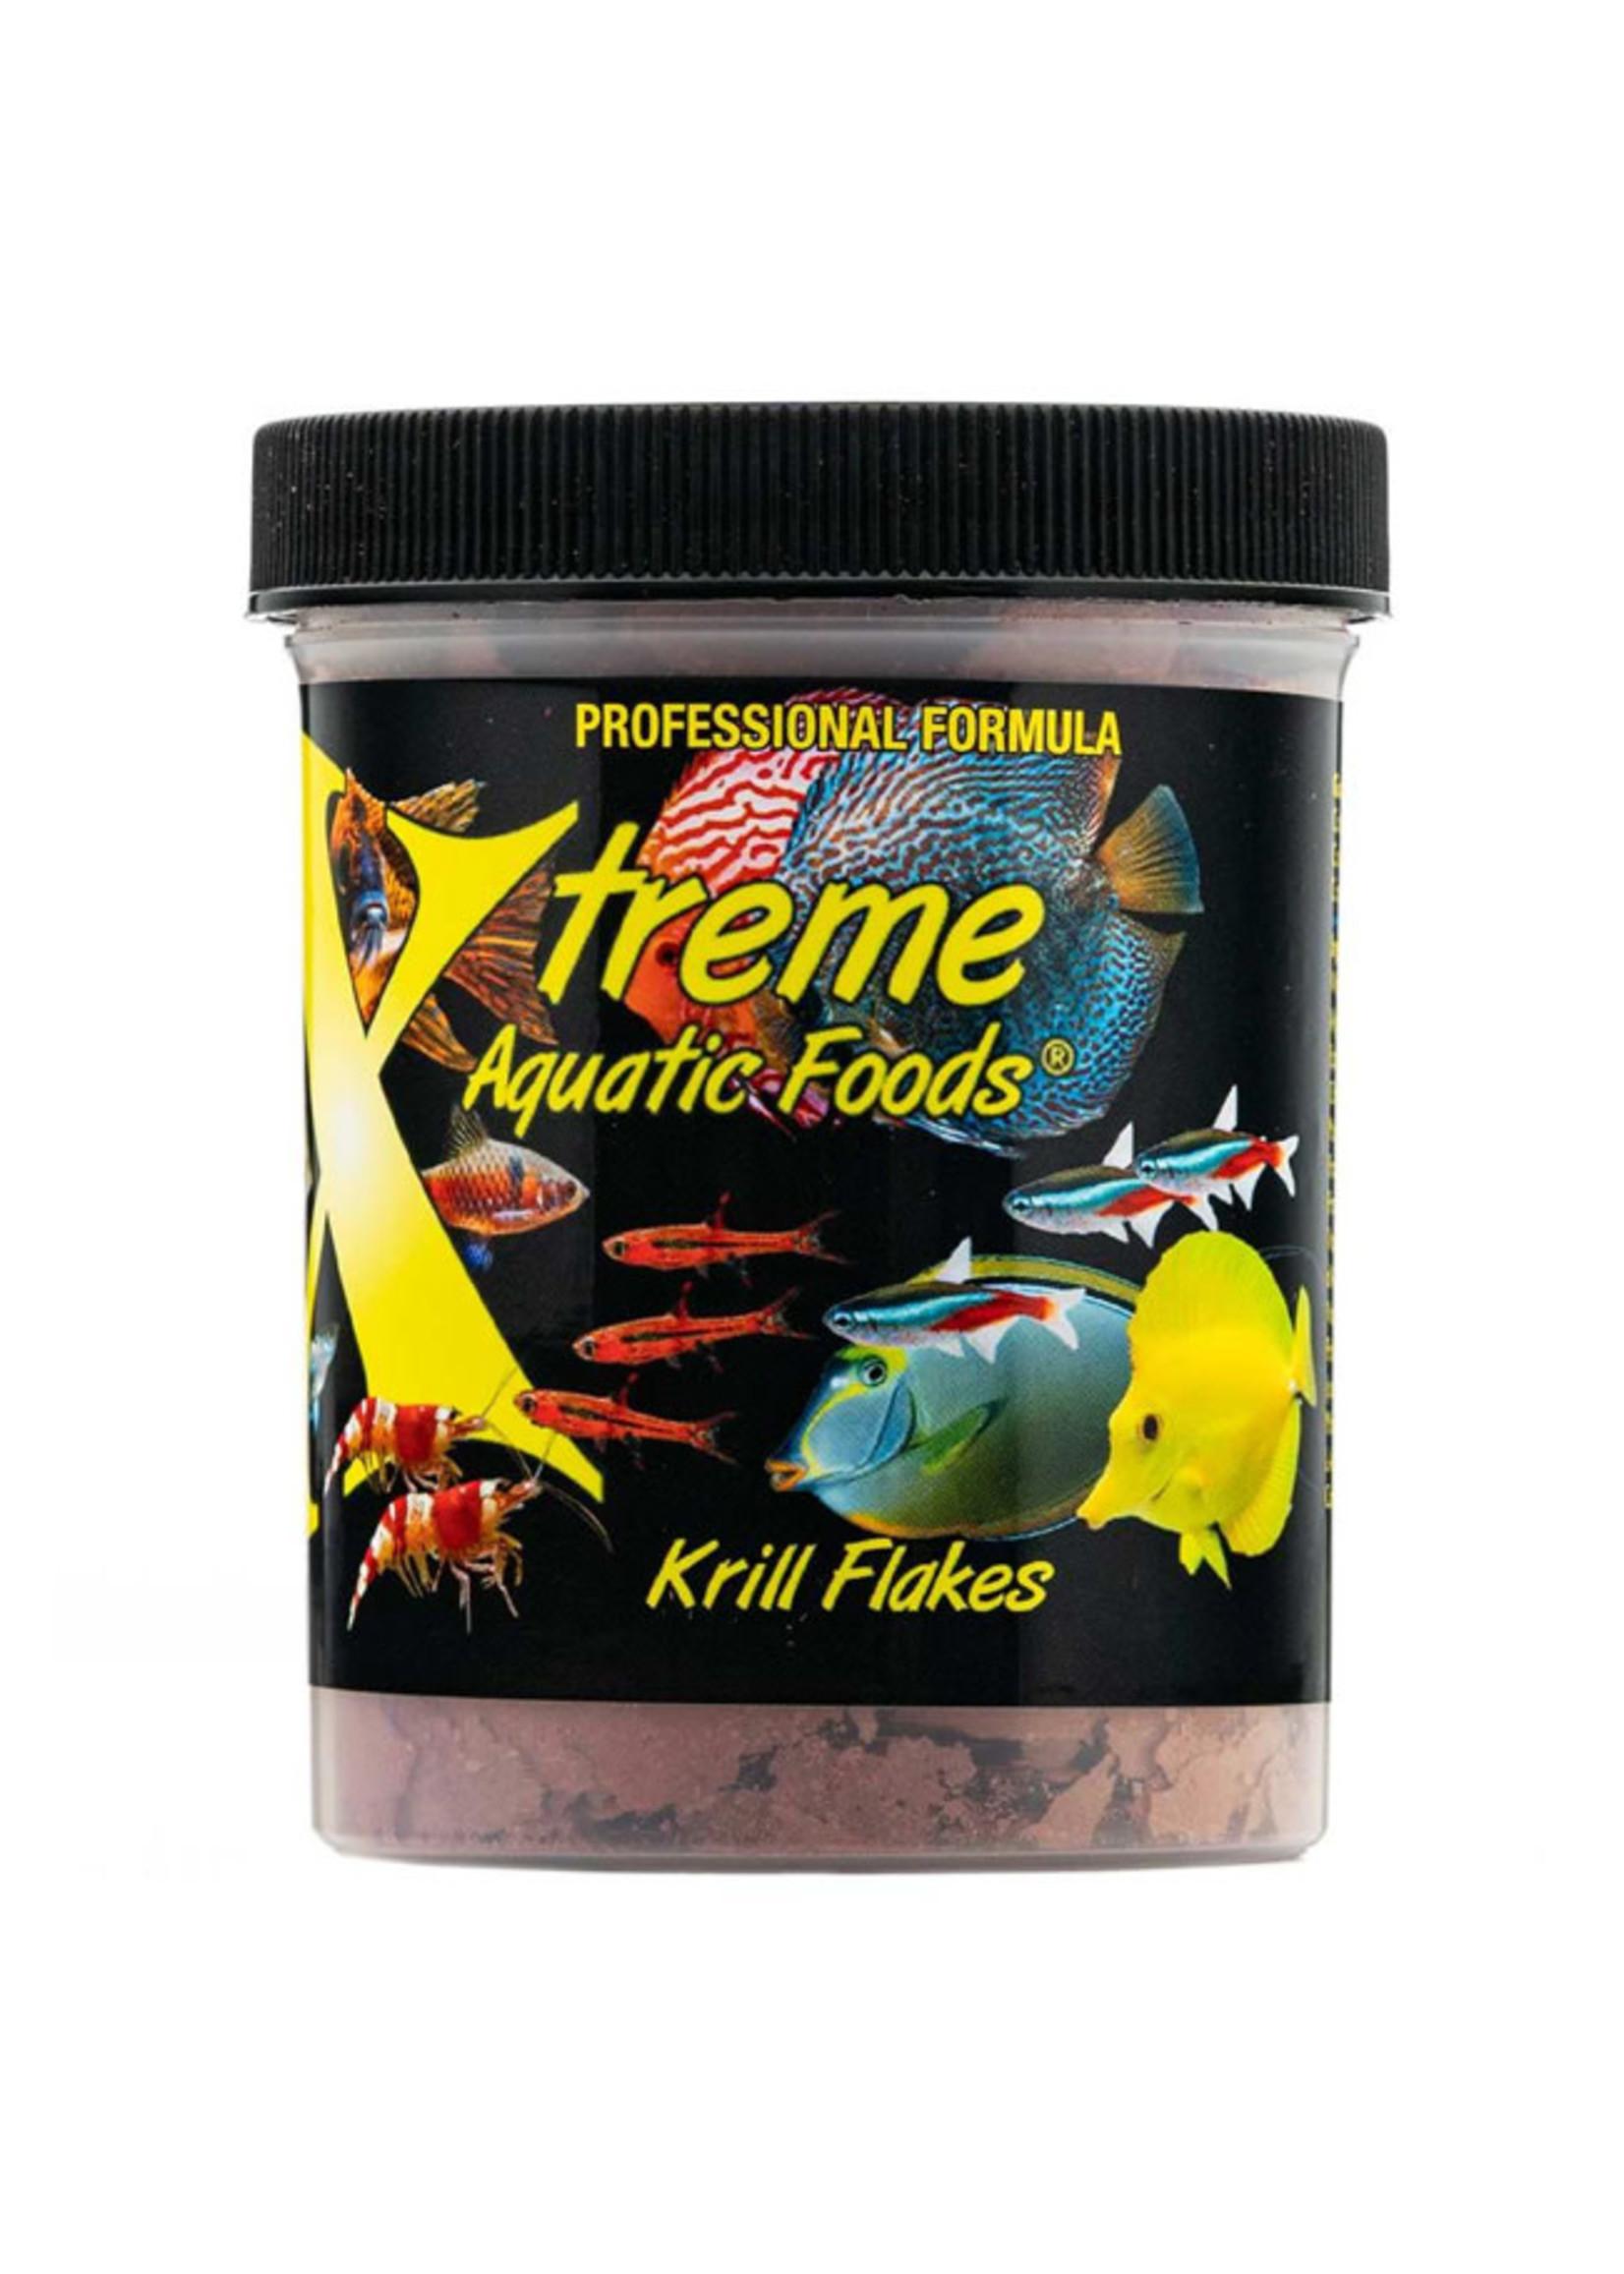 Xtreme Aquatic Foods Xtreme Krill Flakes